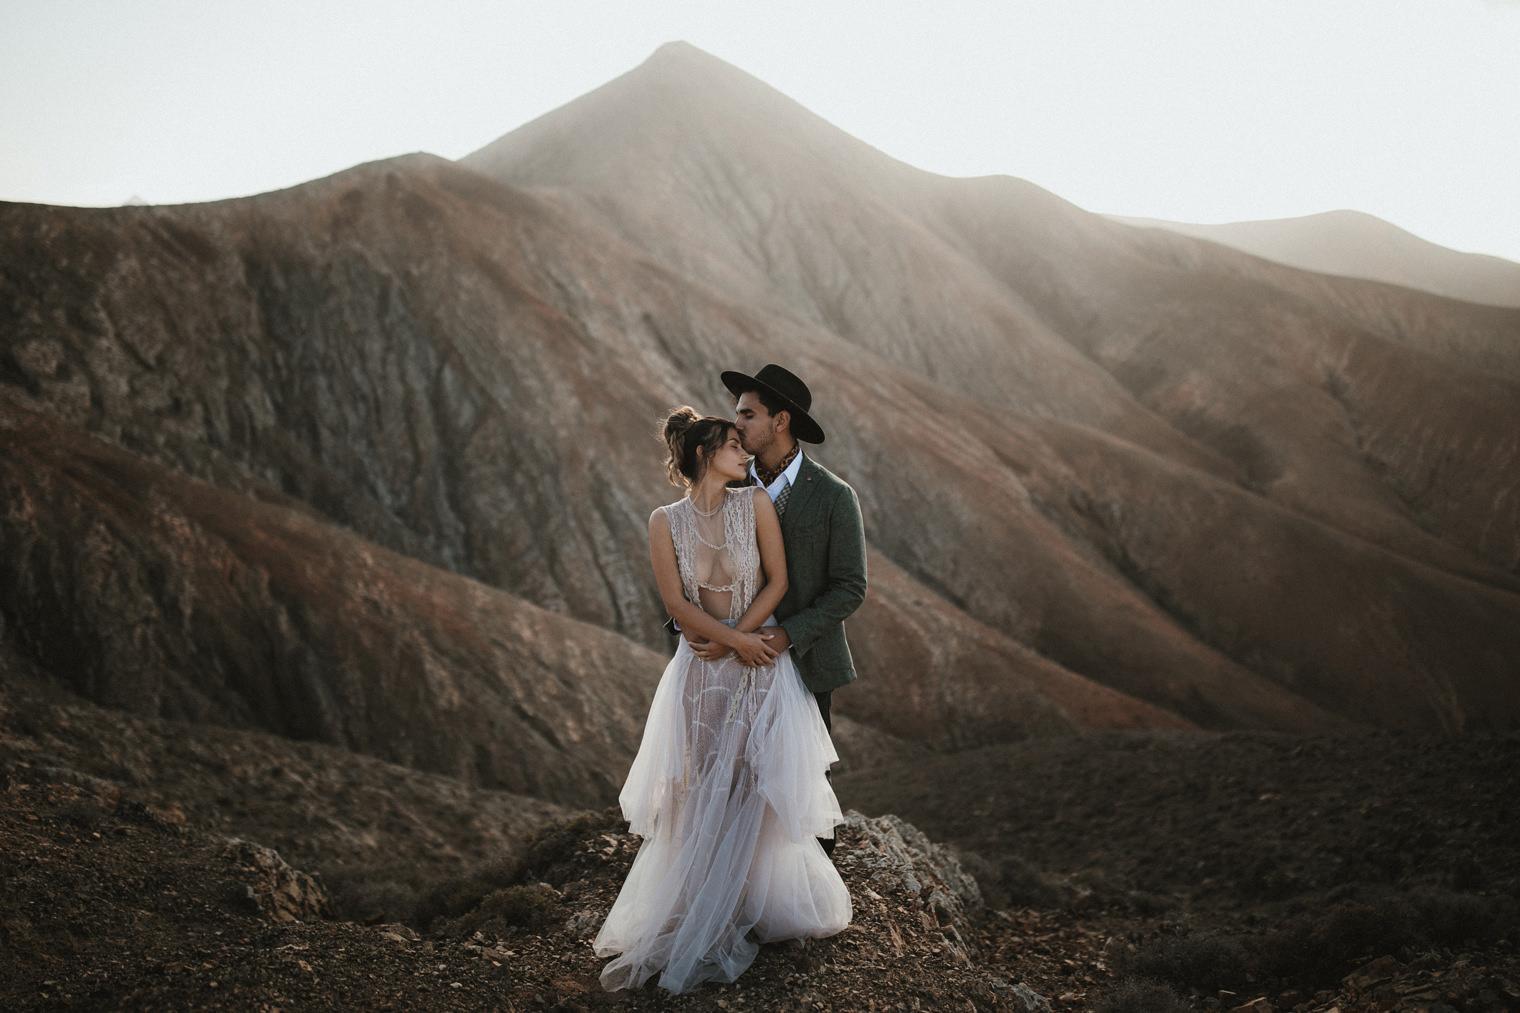 Groom kissing bride in Fuerteventura during their elopement shoot